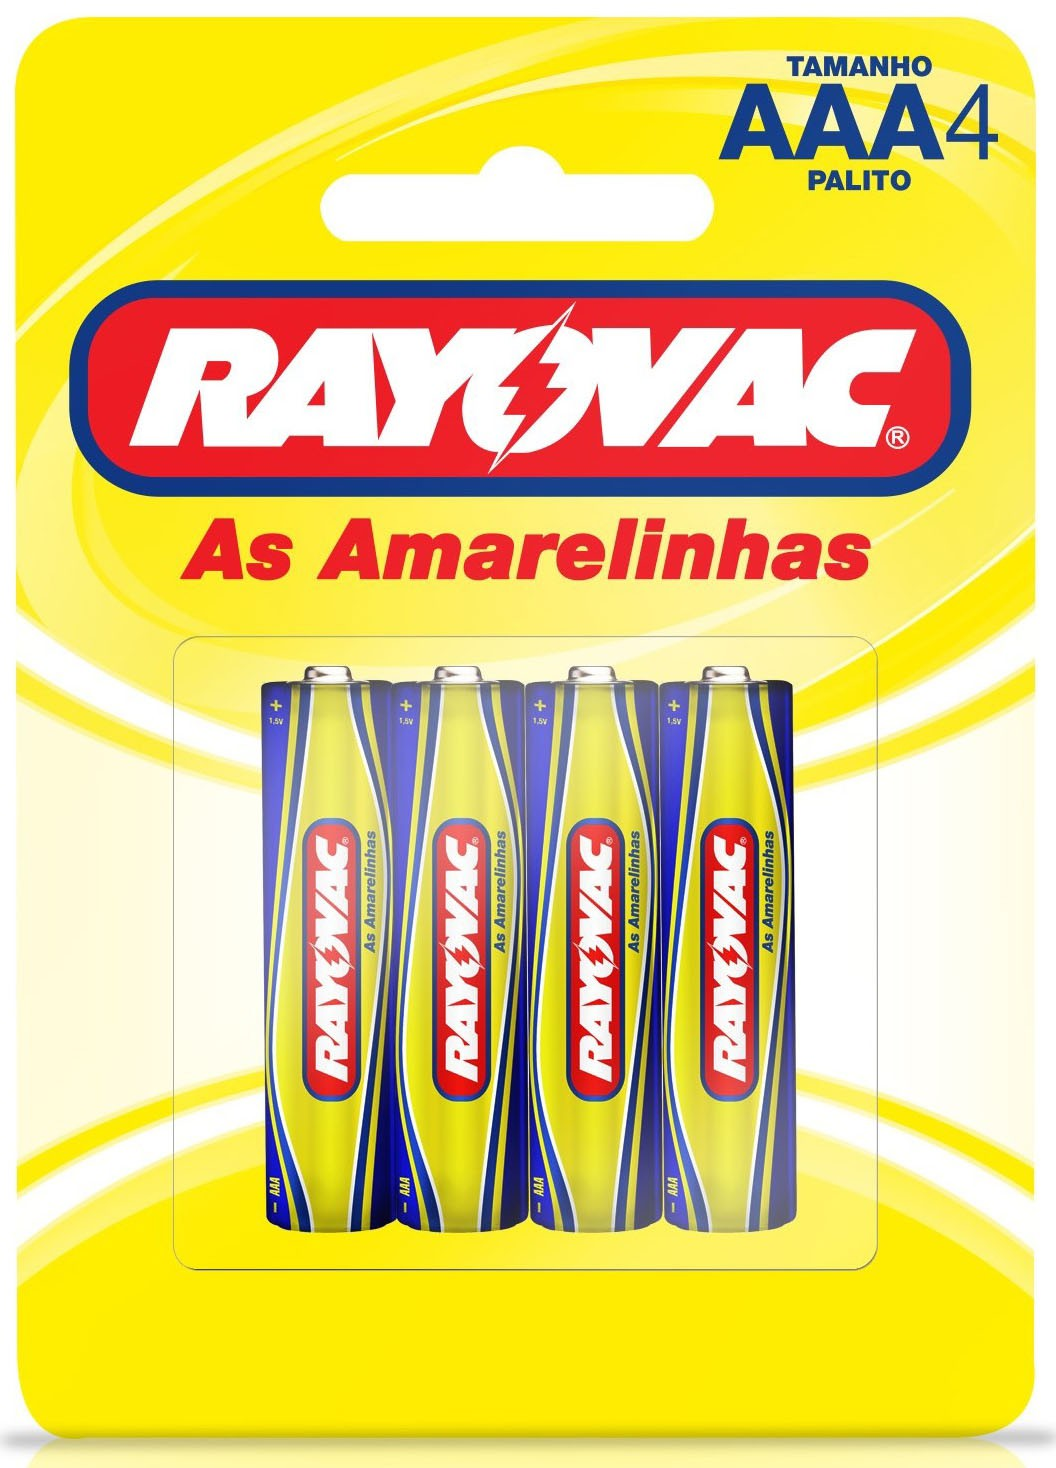 20 Pilhas AAA Zinco Carvão RAYOVAC 5 cartelas